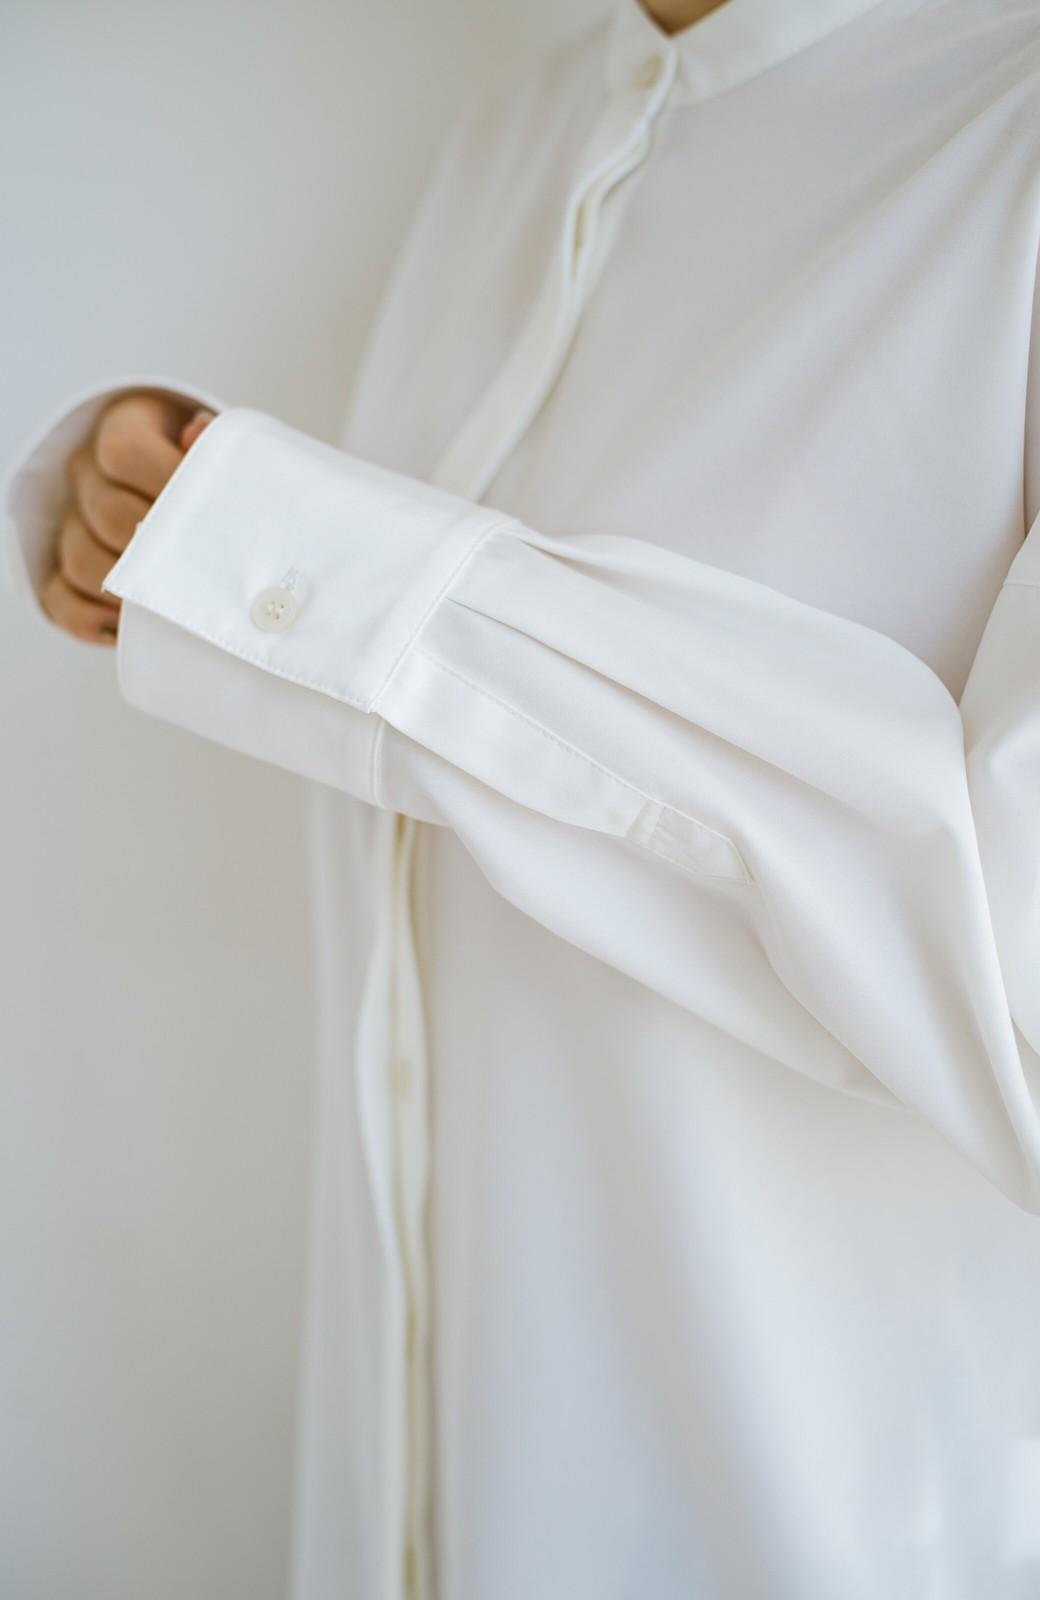 haco! 【肩幅党】肩幅広めがなんのその!華奢見せをとことん追求した重ね着にも便利なスタンドカラーシャツ <ホワイト>の商品写真7